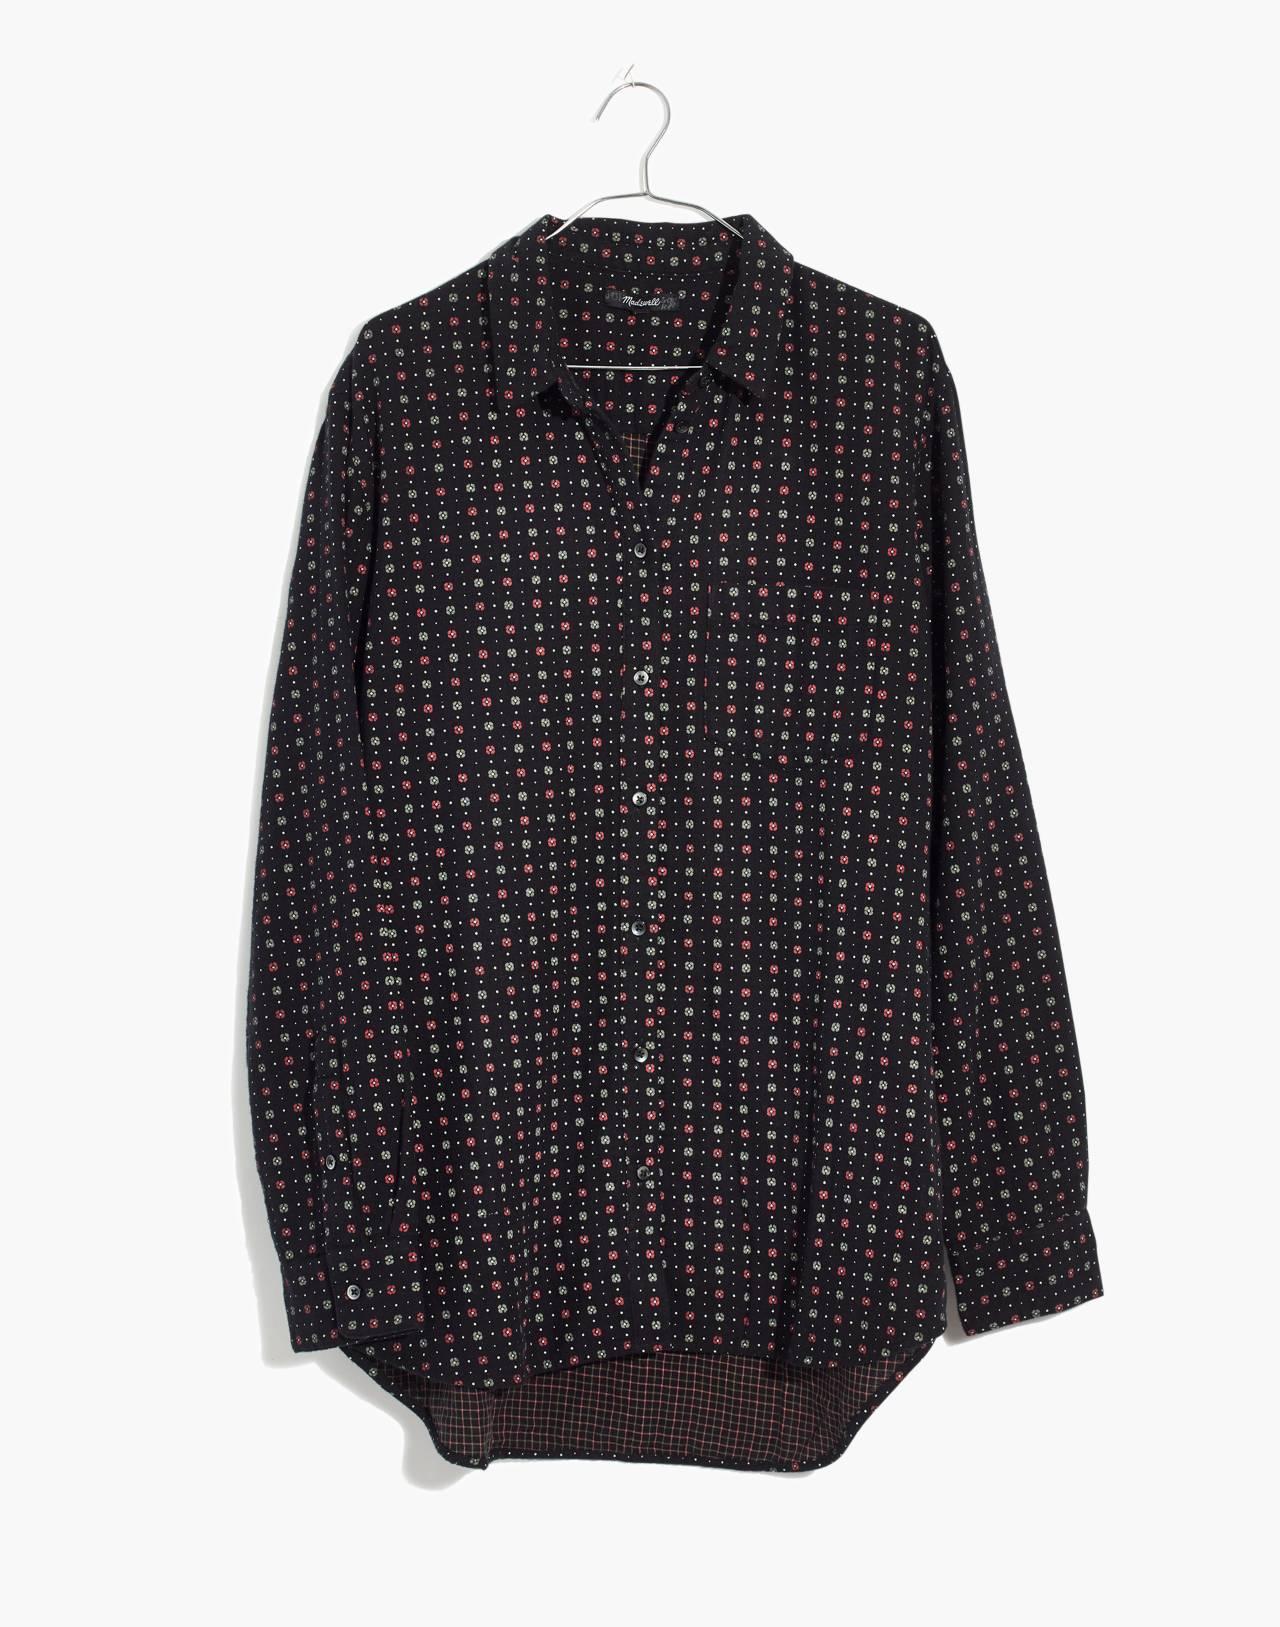 Oversized Ex-Boyfriend Shirt in Mayfair Foulard in foulard dried coral image 4